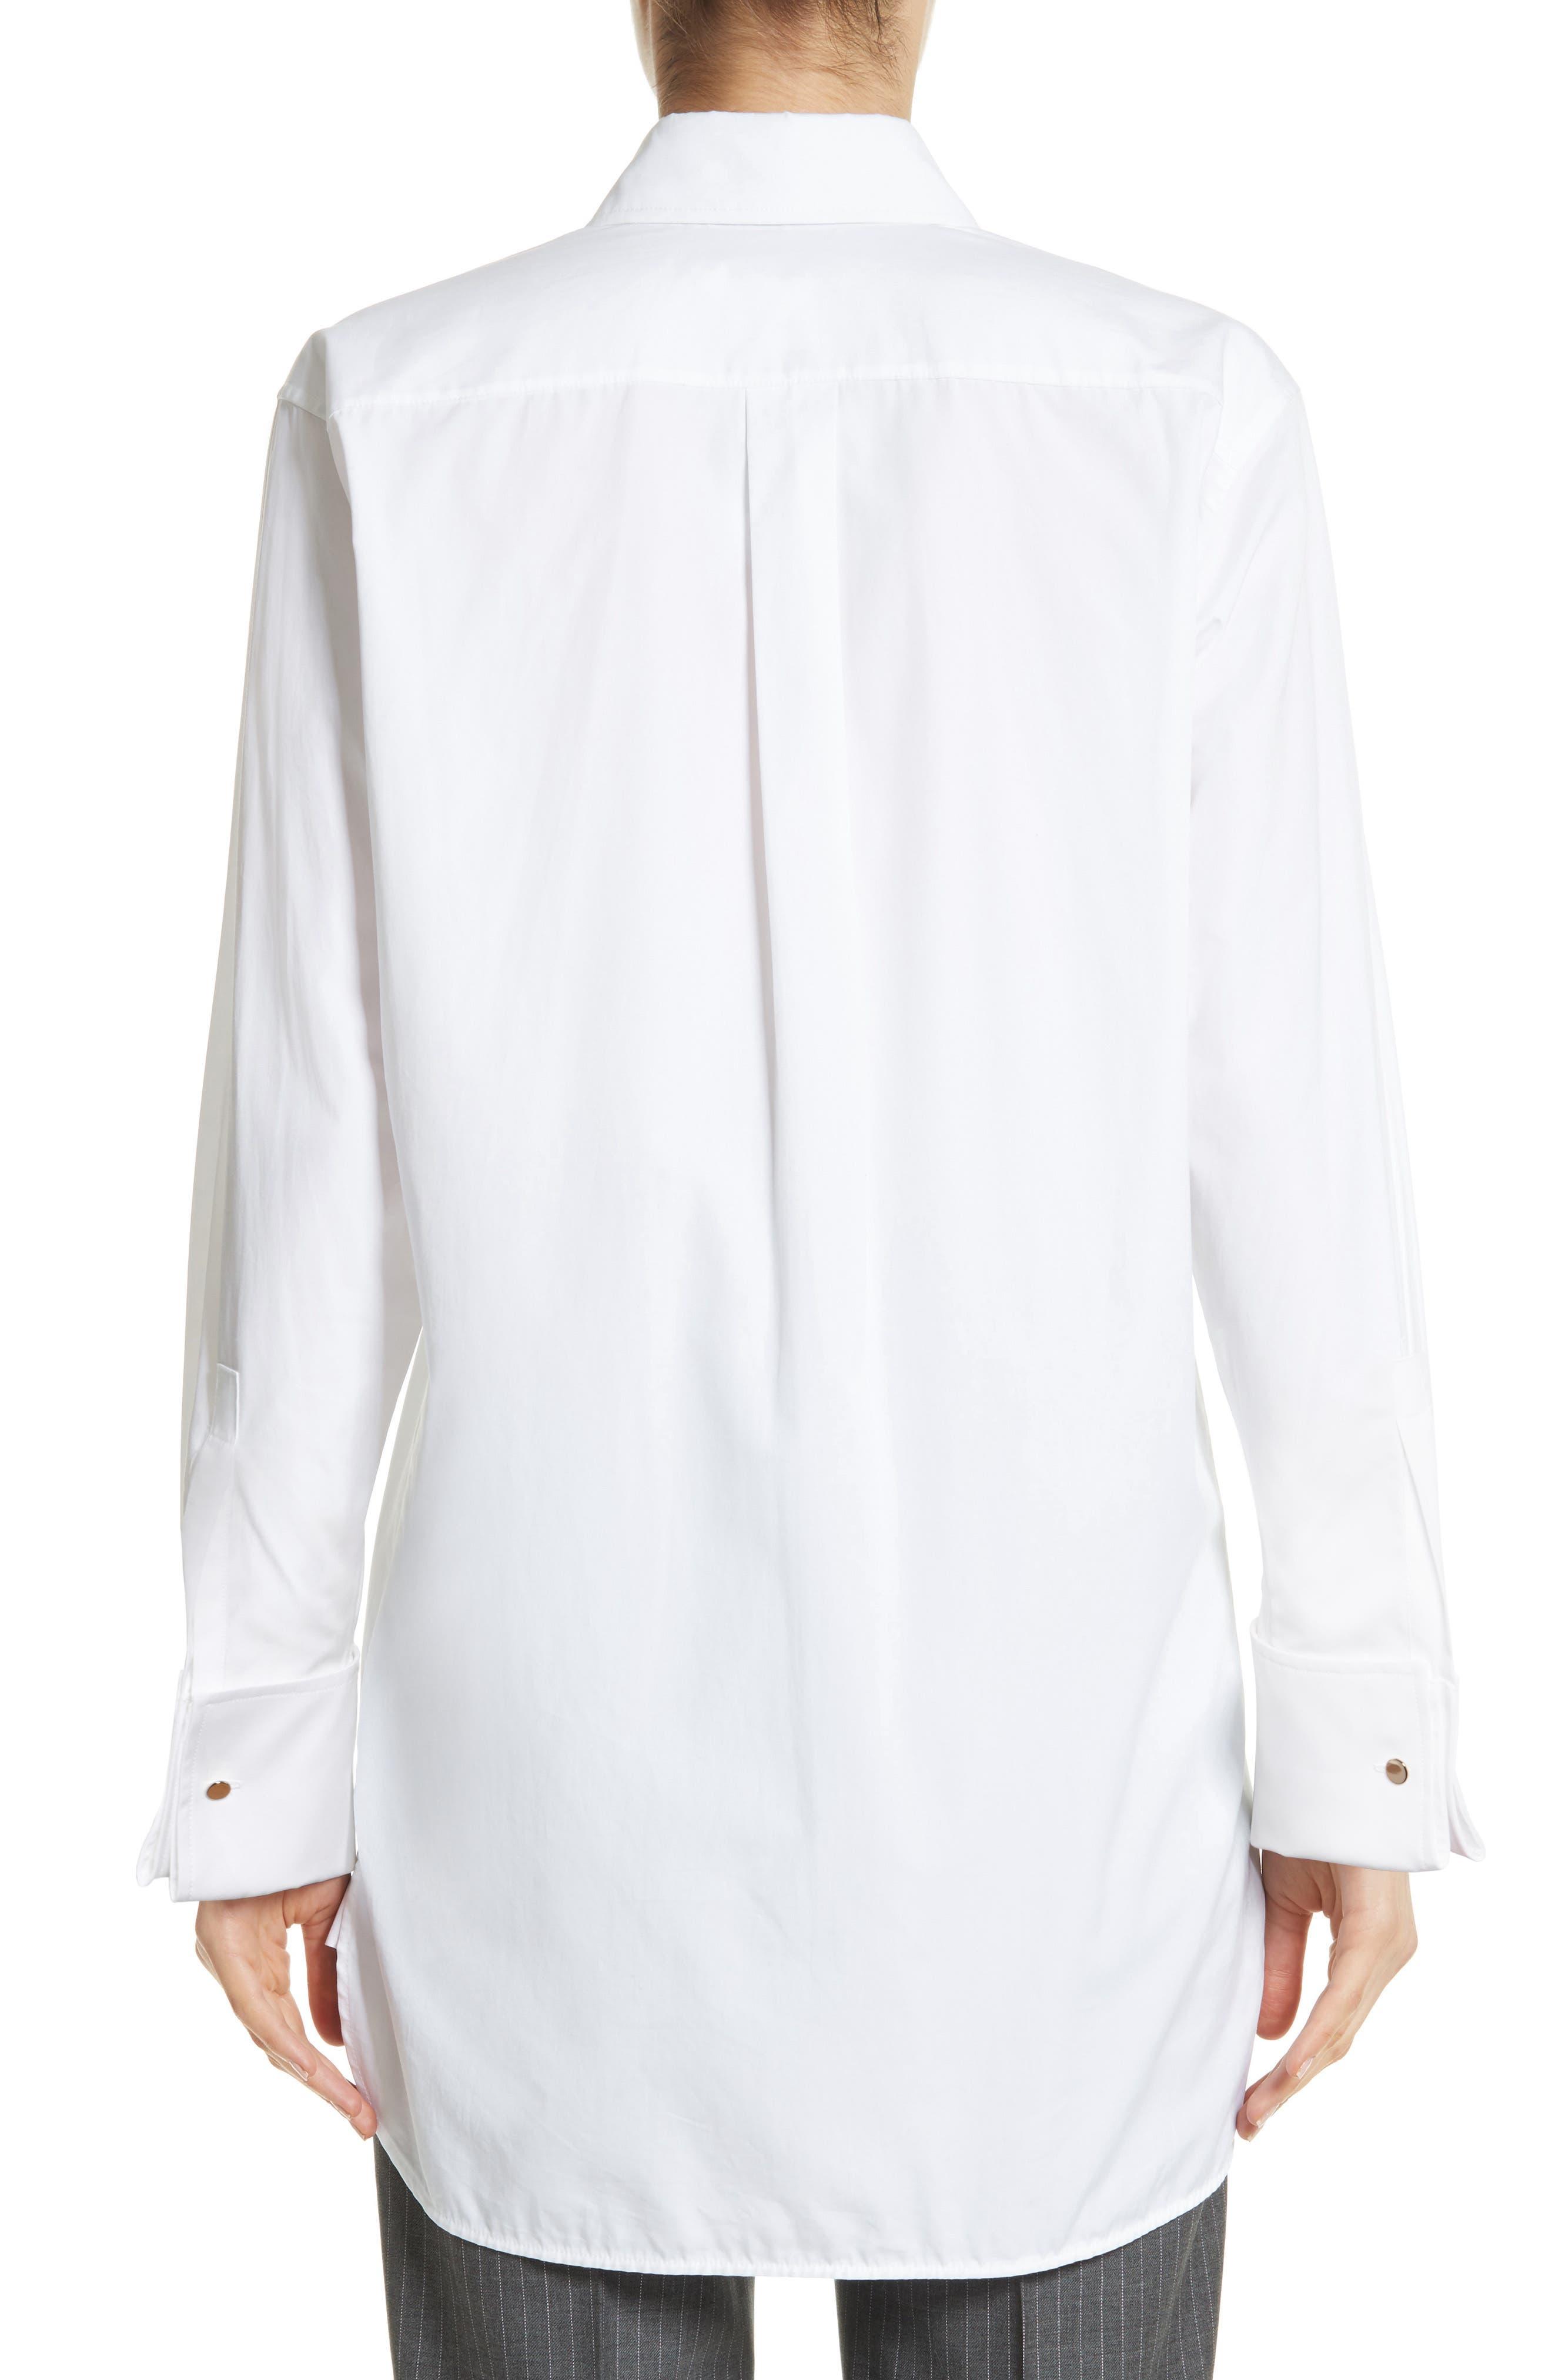 Visivo Cotton Poplin Shirt,                             Alternate thumbnail 2, color,                             101